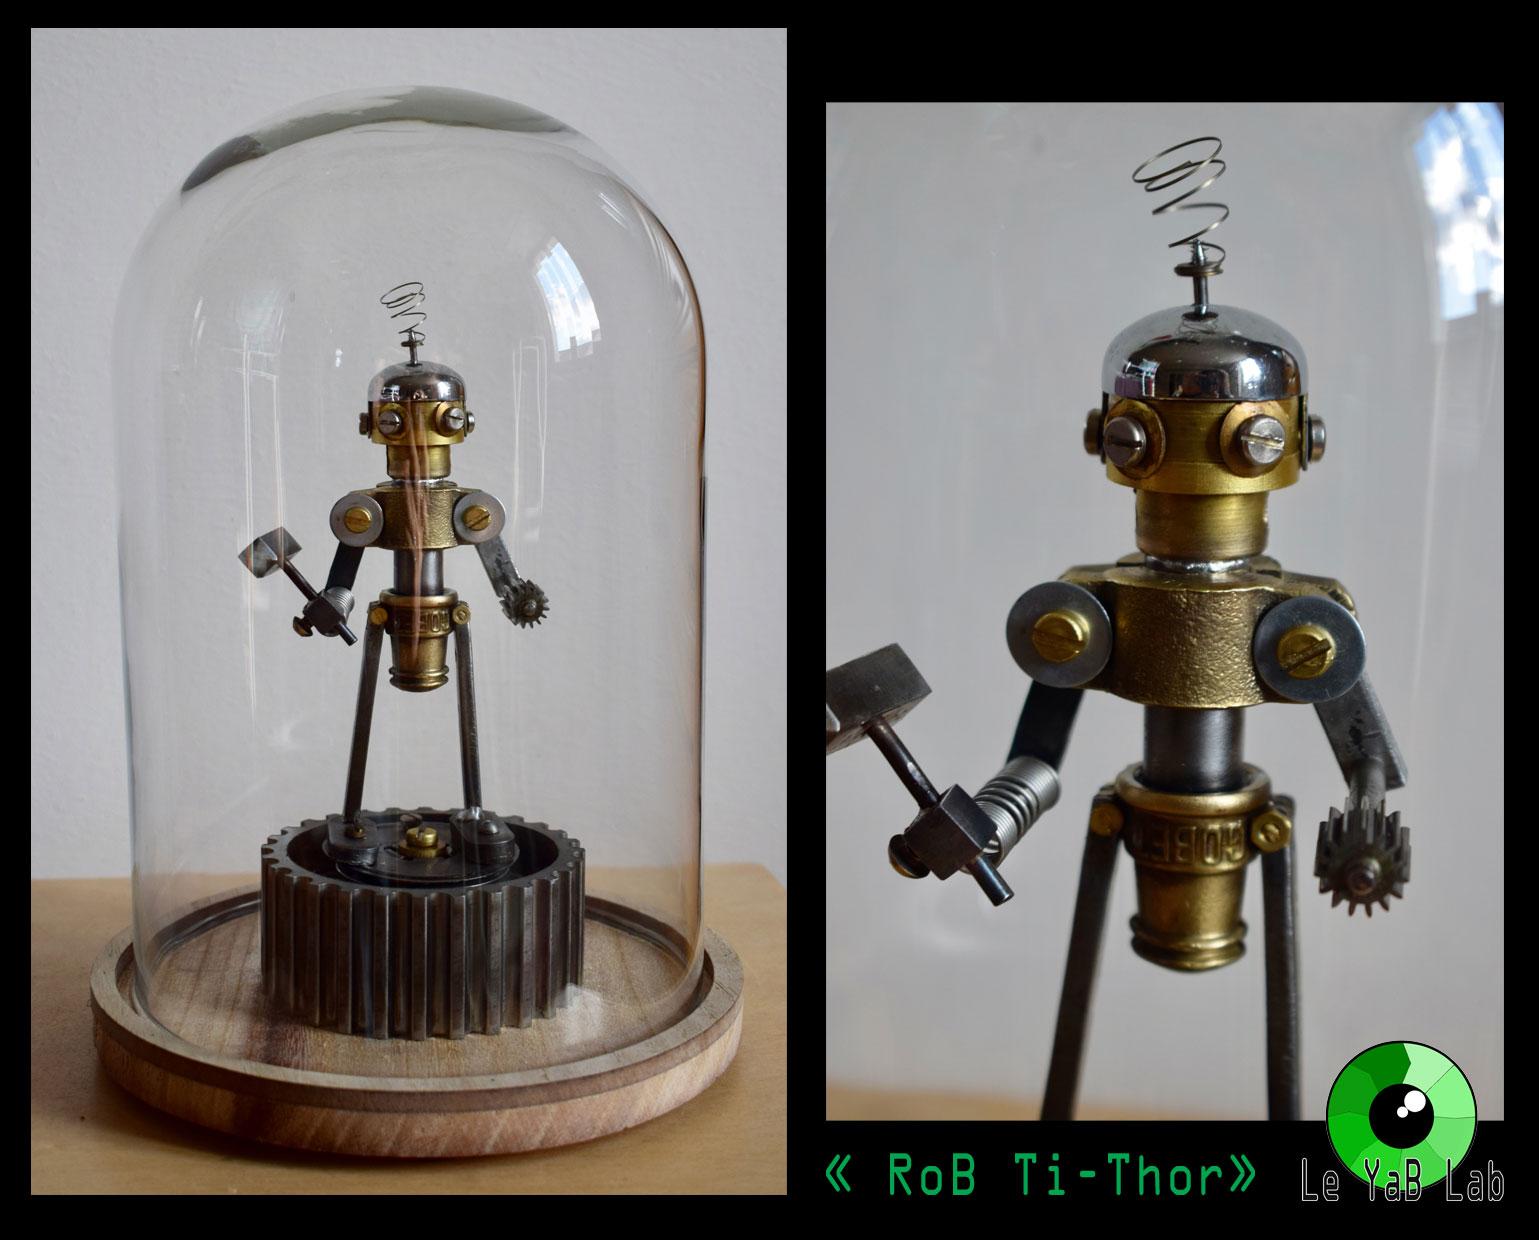 RoB-Ti-Thor